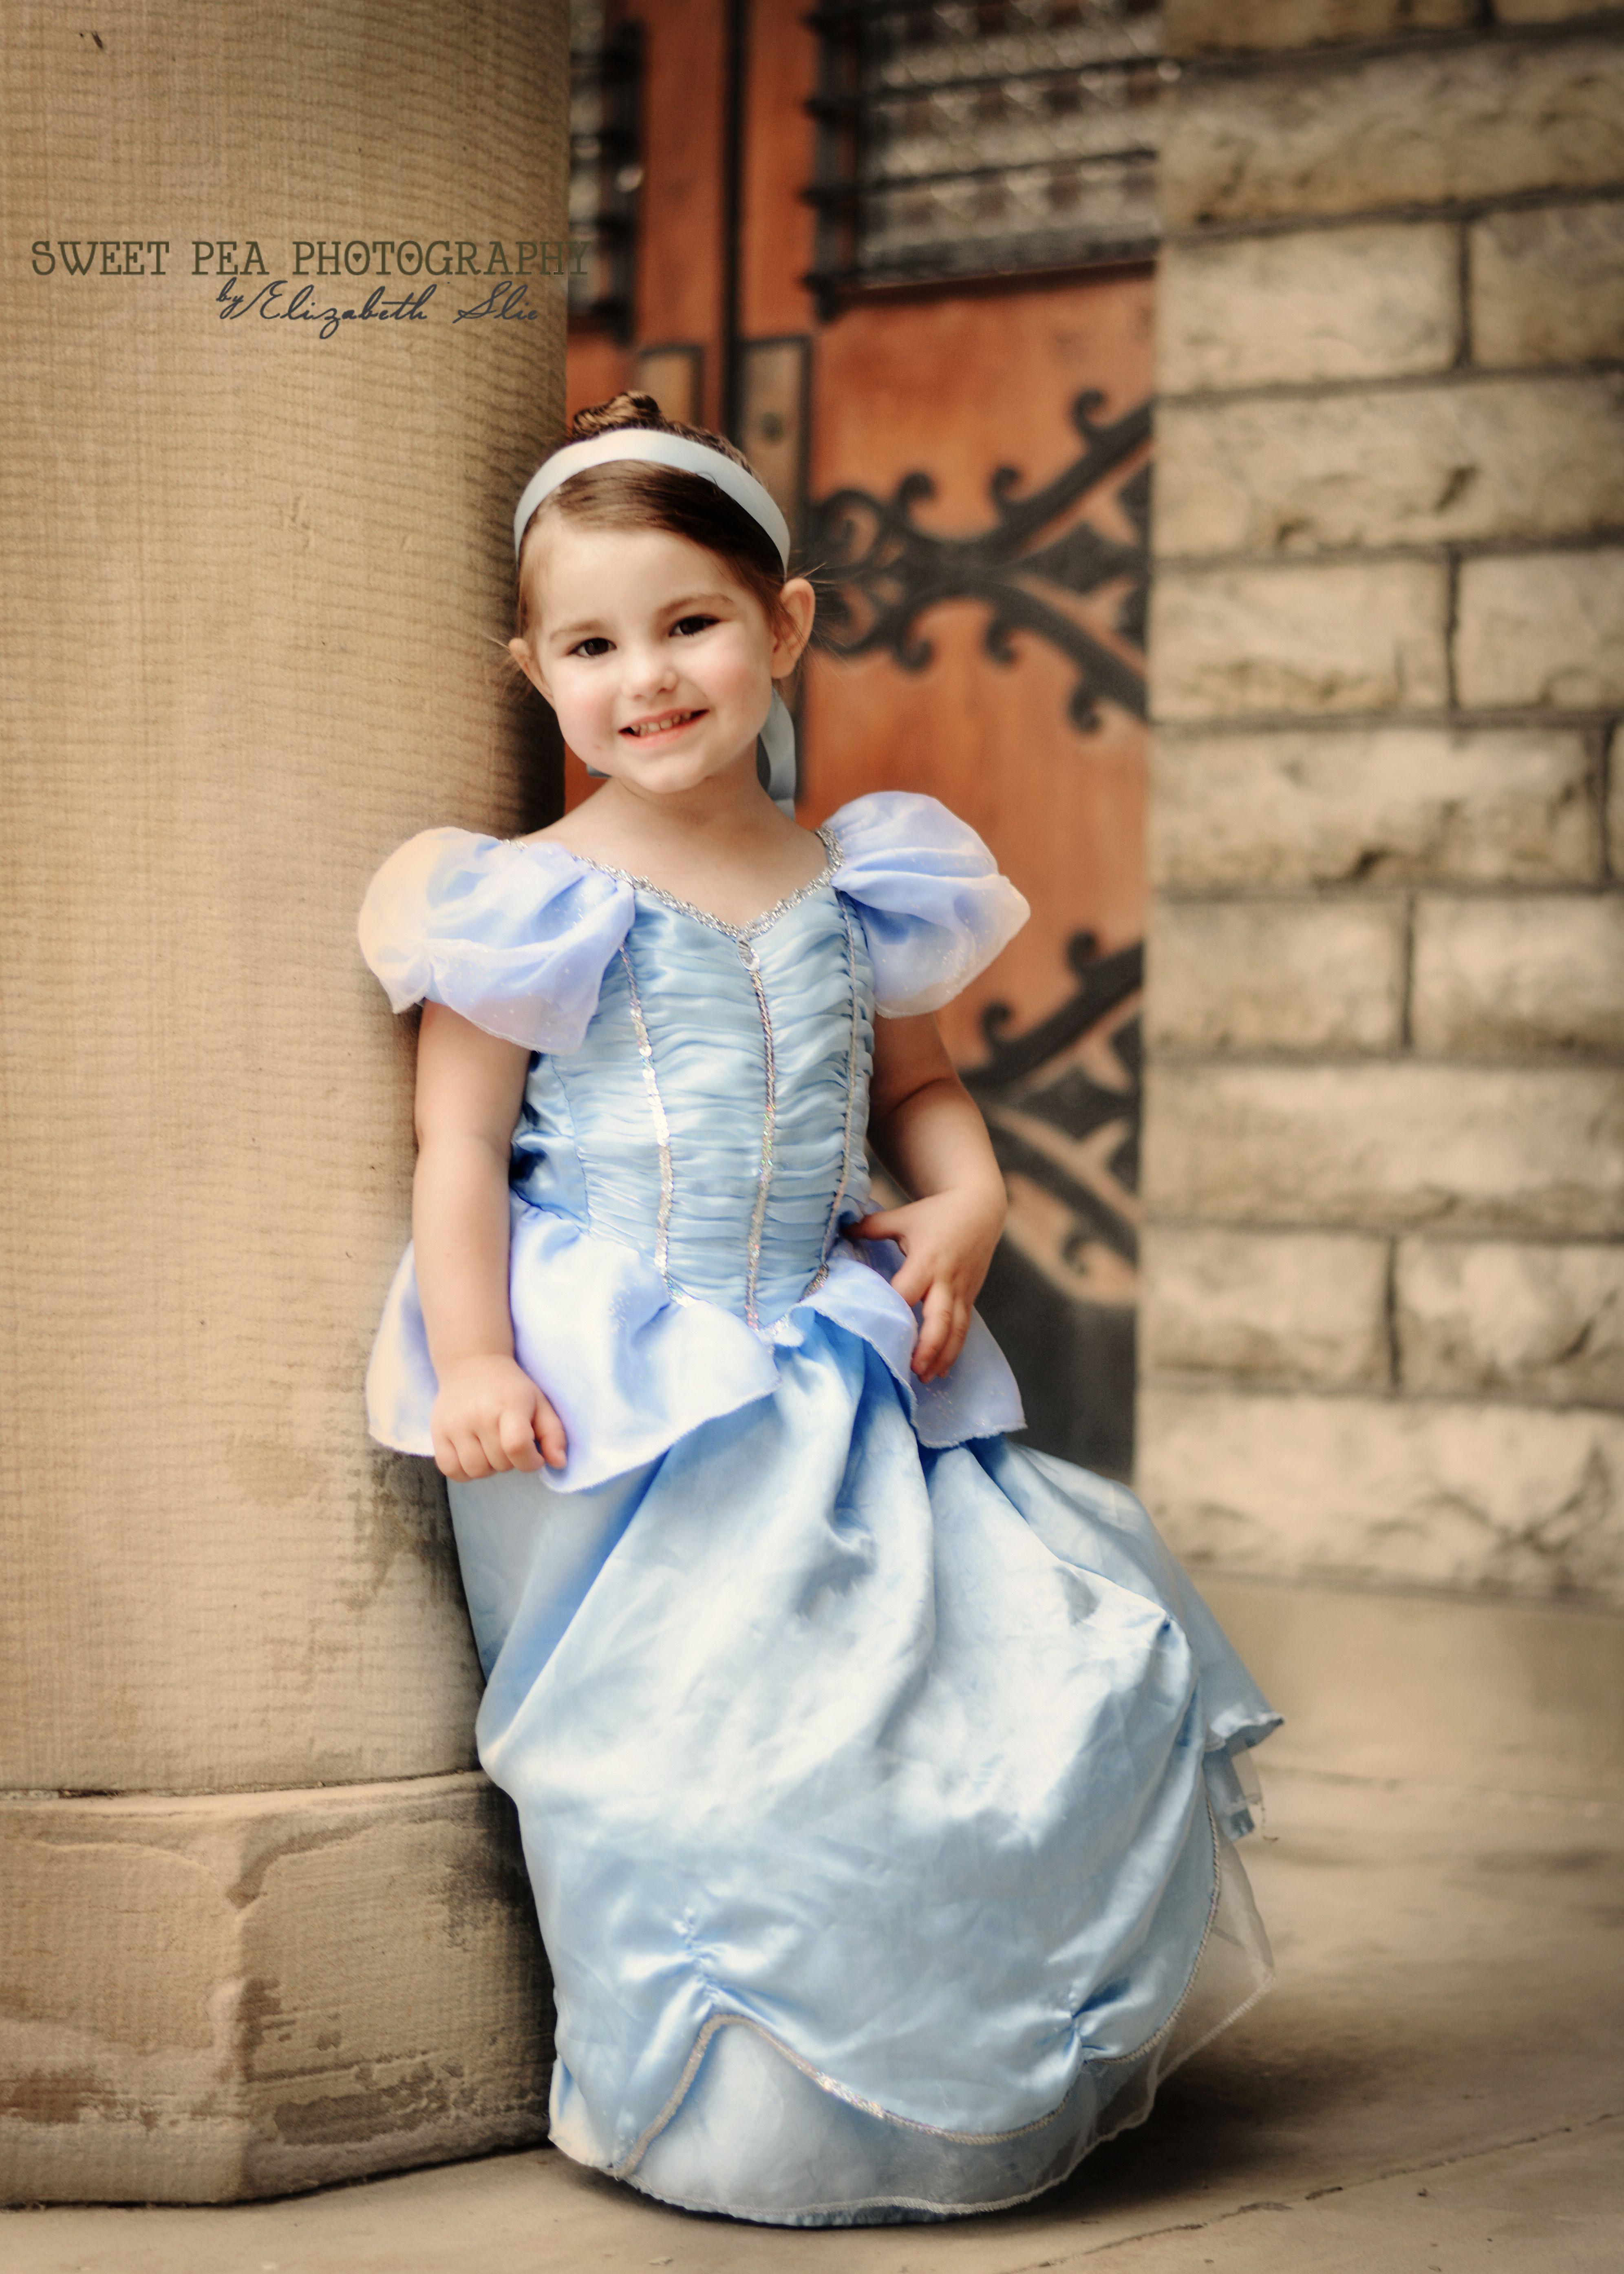 Cinderella Fairy Tale Photo Shoot 3 Year Old Idea Disney Princess Sweet Pea Photography Norwalk Oh